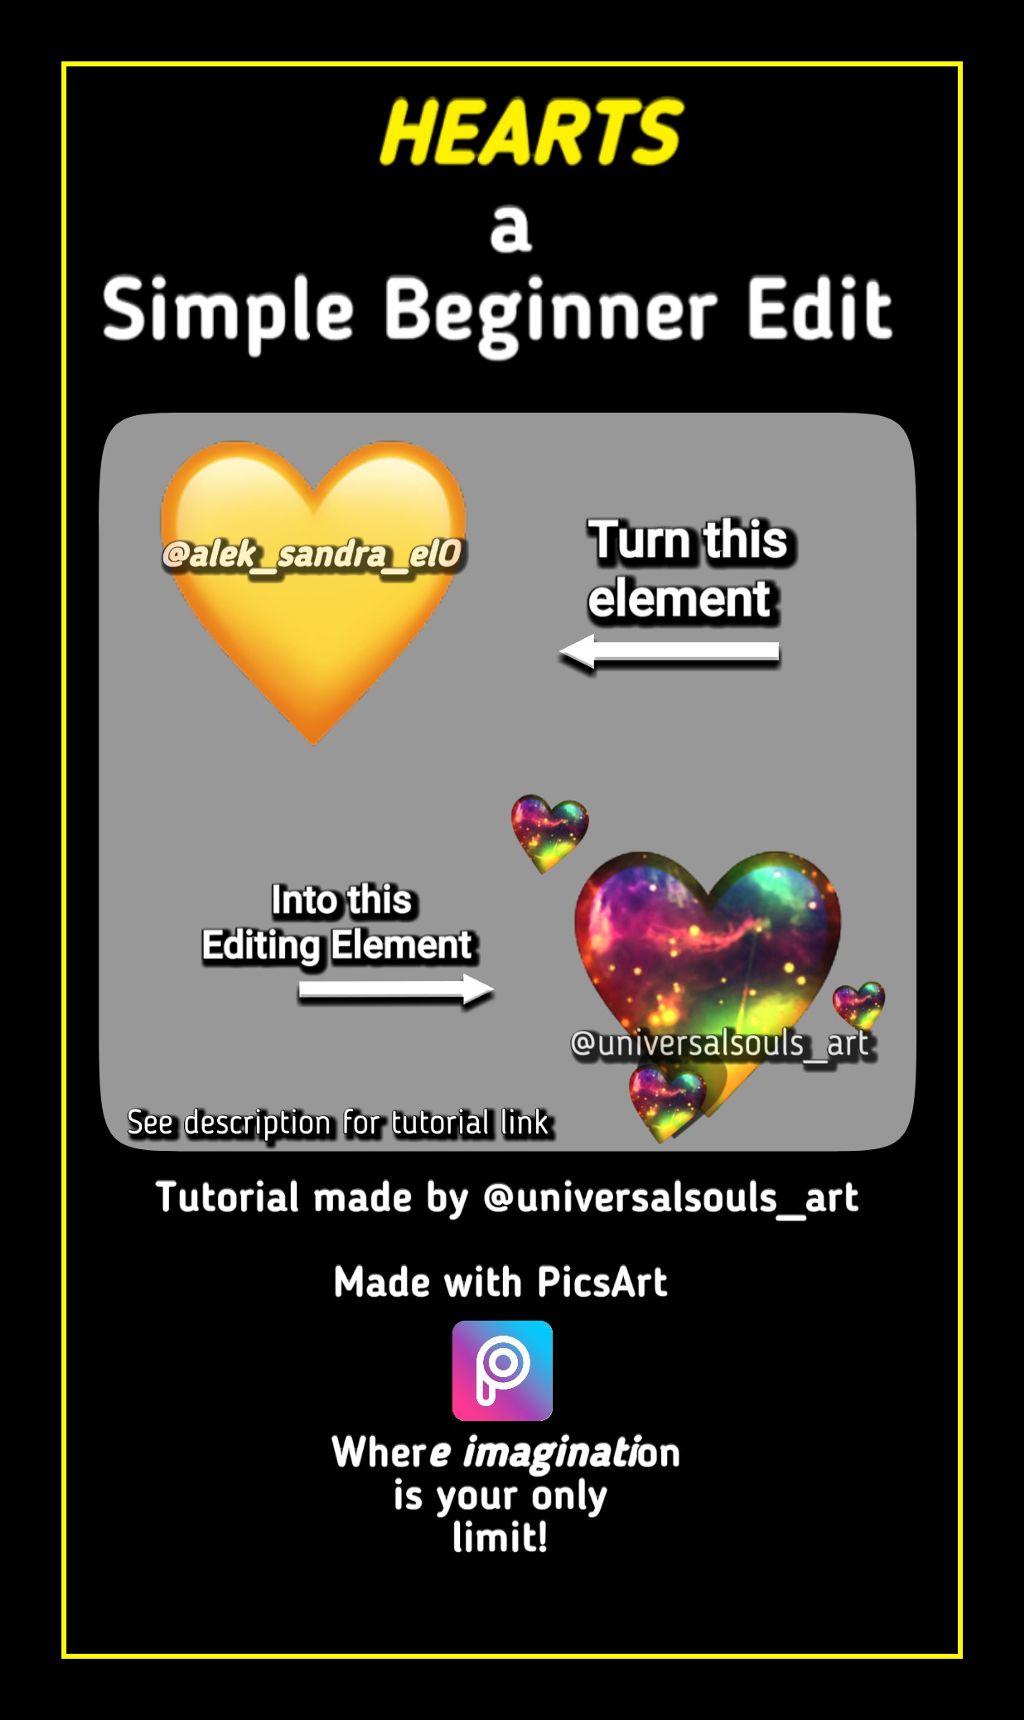 https://youtu.be/PJ4awZkoDbU  #quicktip #simple #beginnertutorial #alecreation #hearts #drawtools 14 minute video with voice over